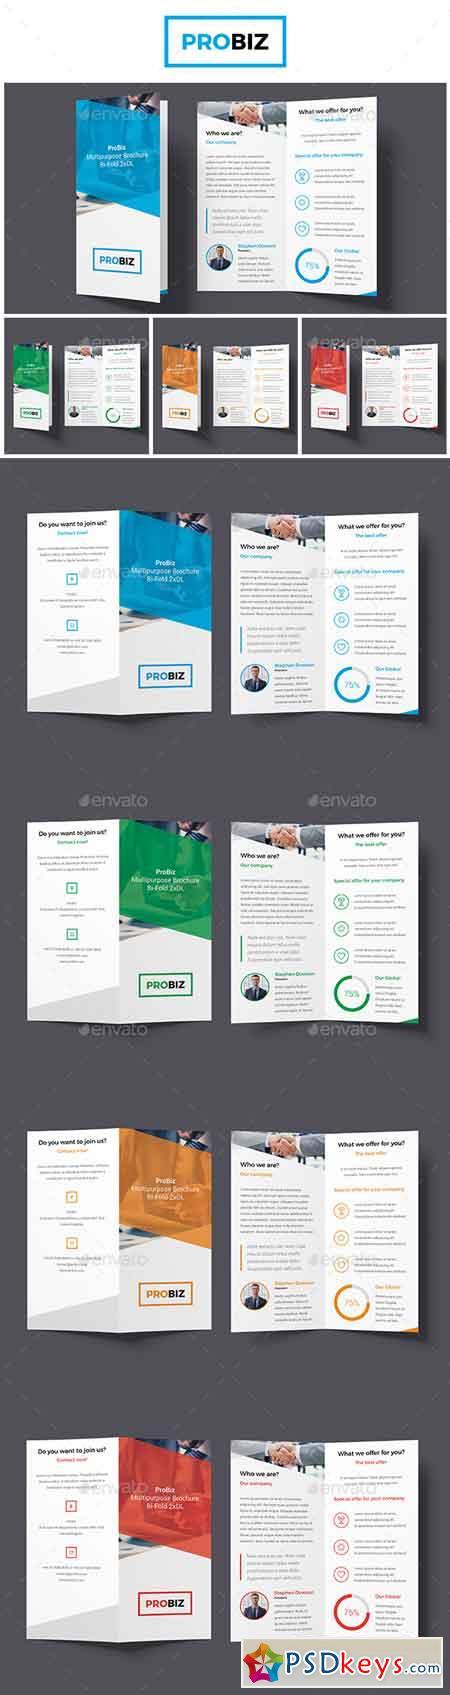 ProBiz – Business and Corporate Brochure Bi-Fold (2xDL) 19125132